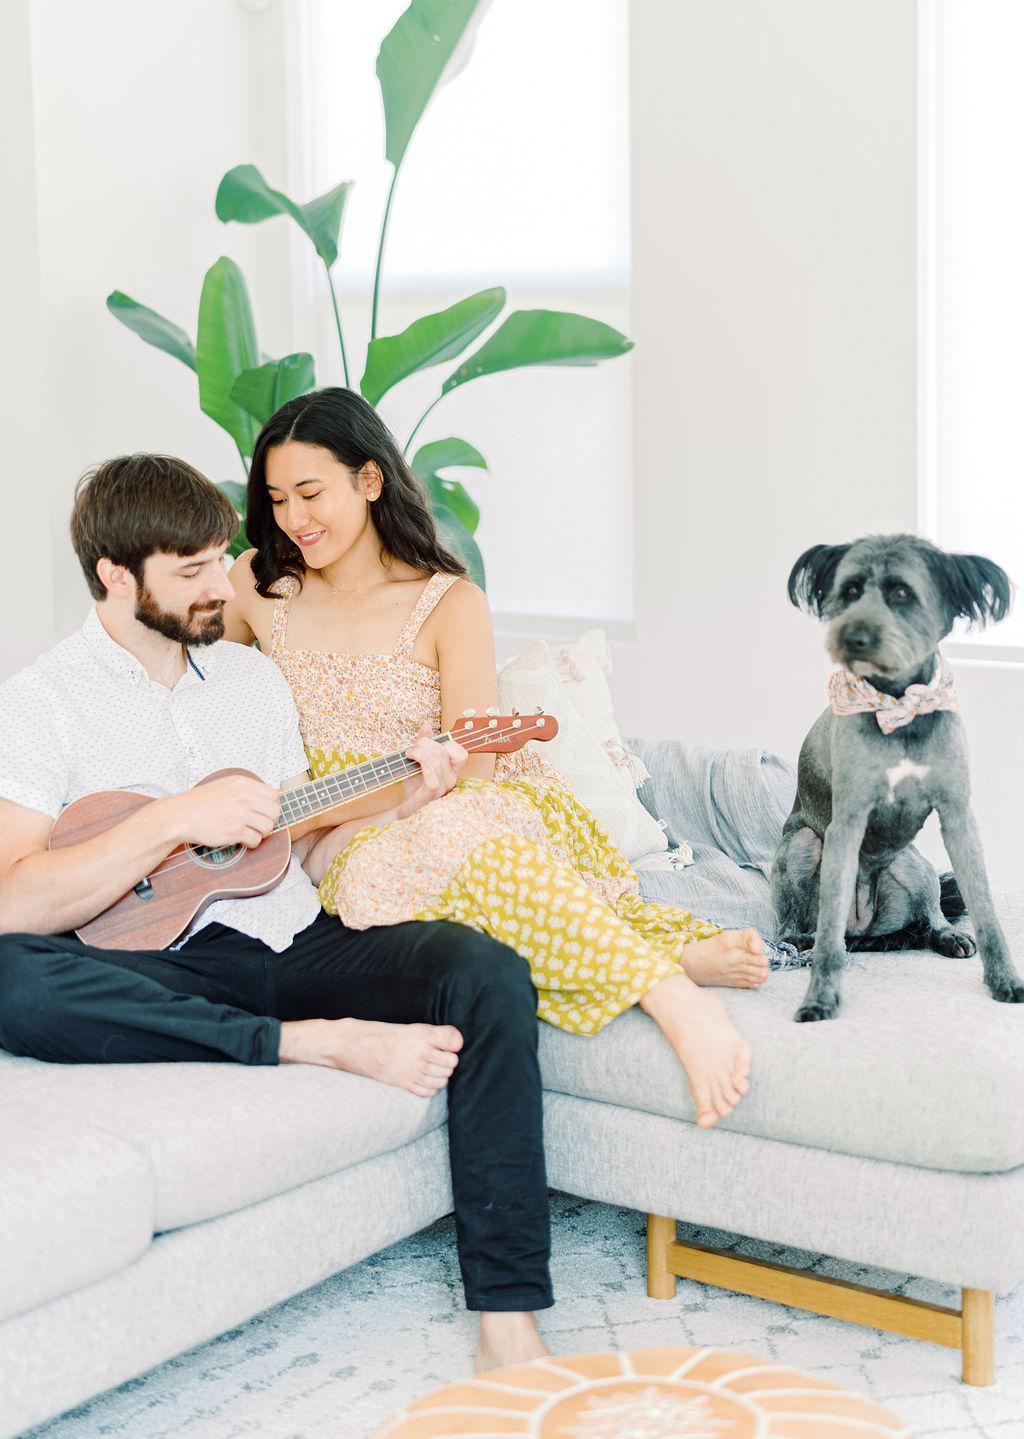 Austin-Intimate-Wedding-Elopement-Photograper-Film-Downtown-Engagement-Session-Home-57.jpg